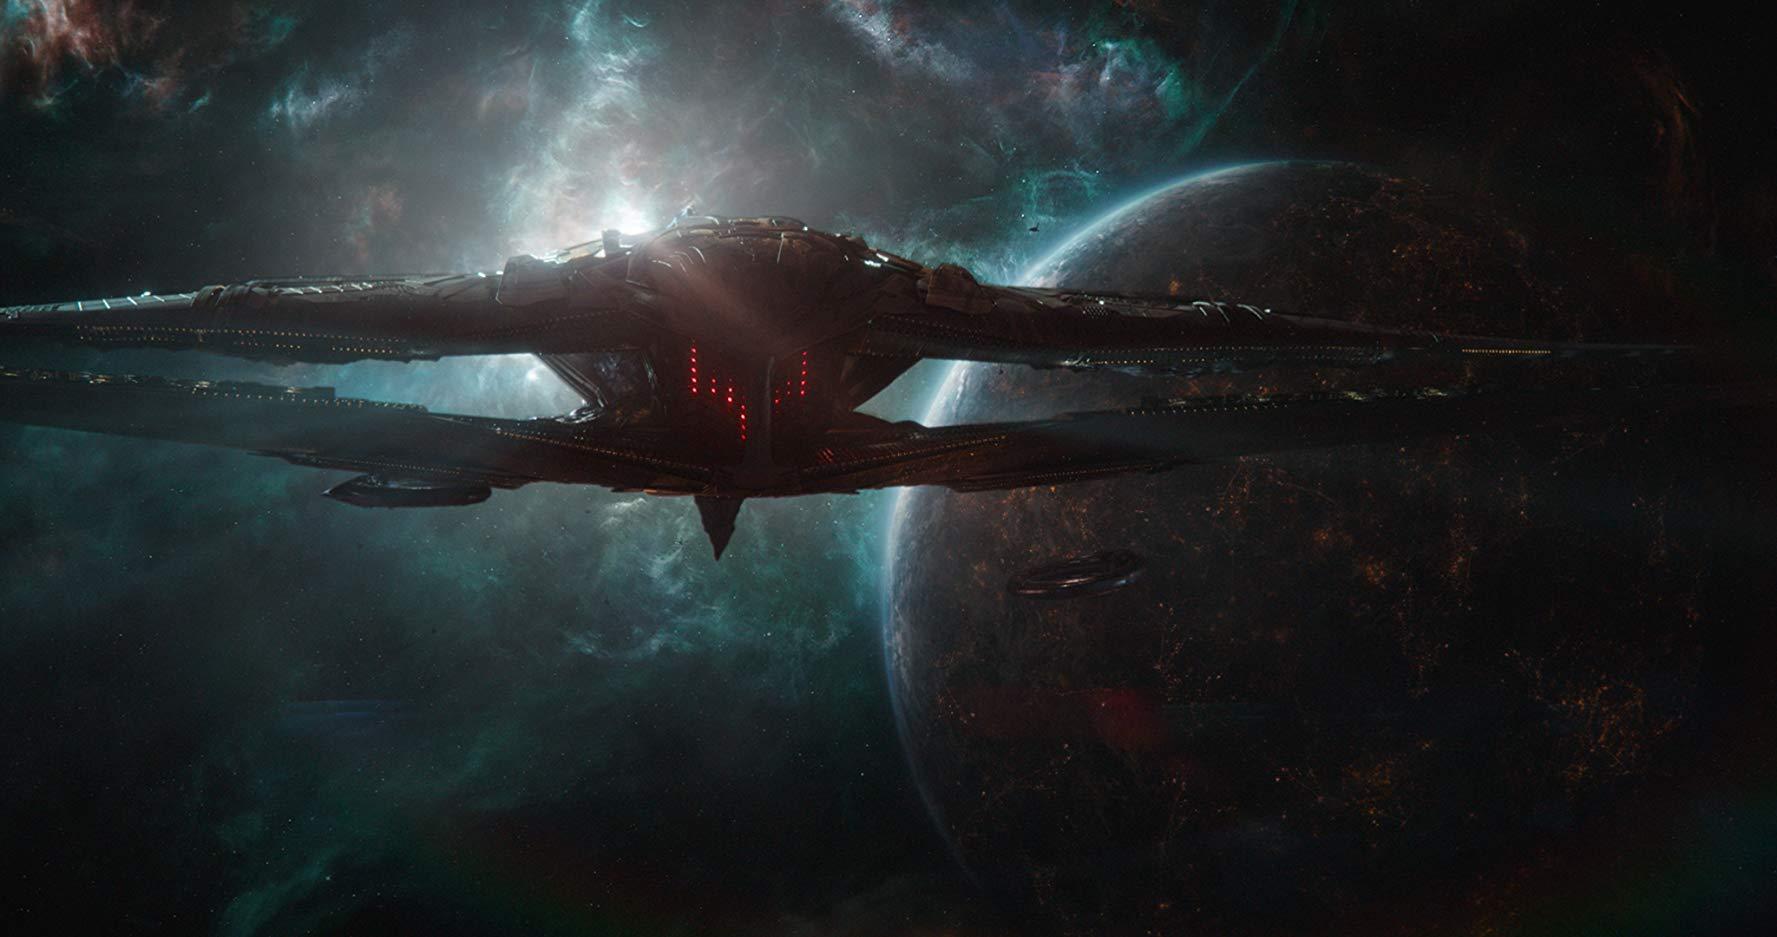 Avengers Endgame - Thanos ship